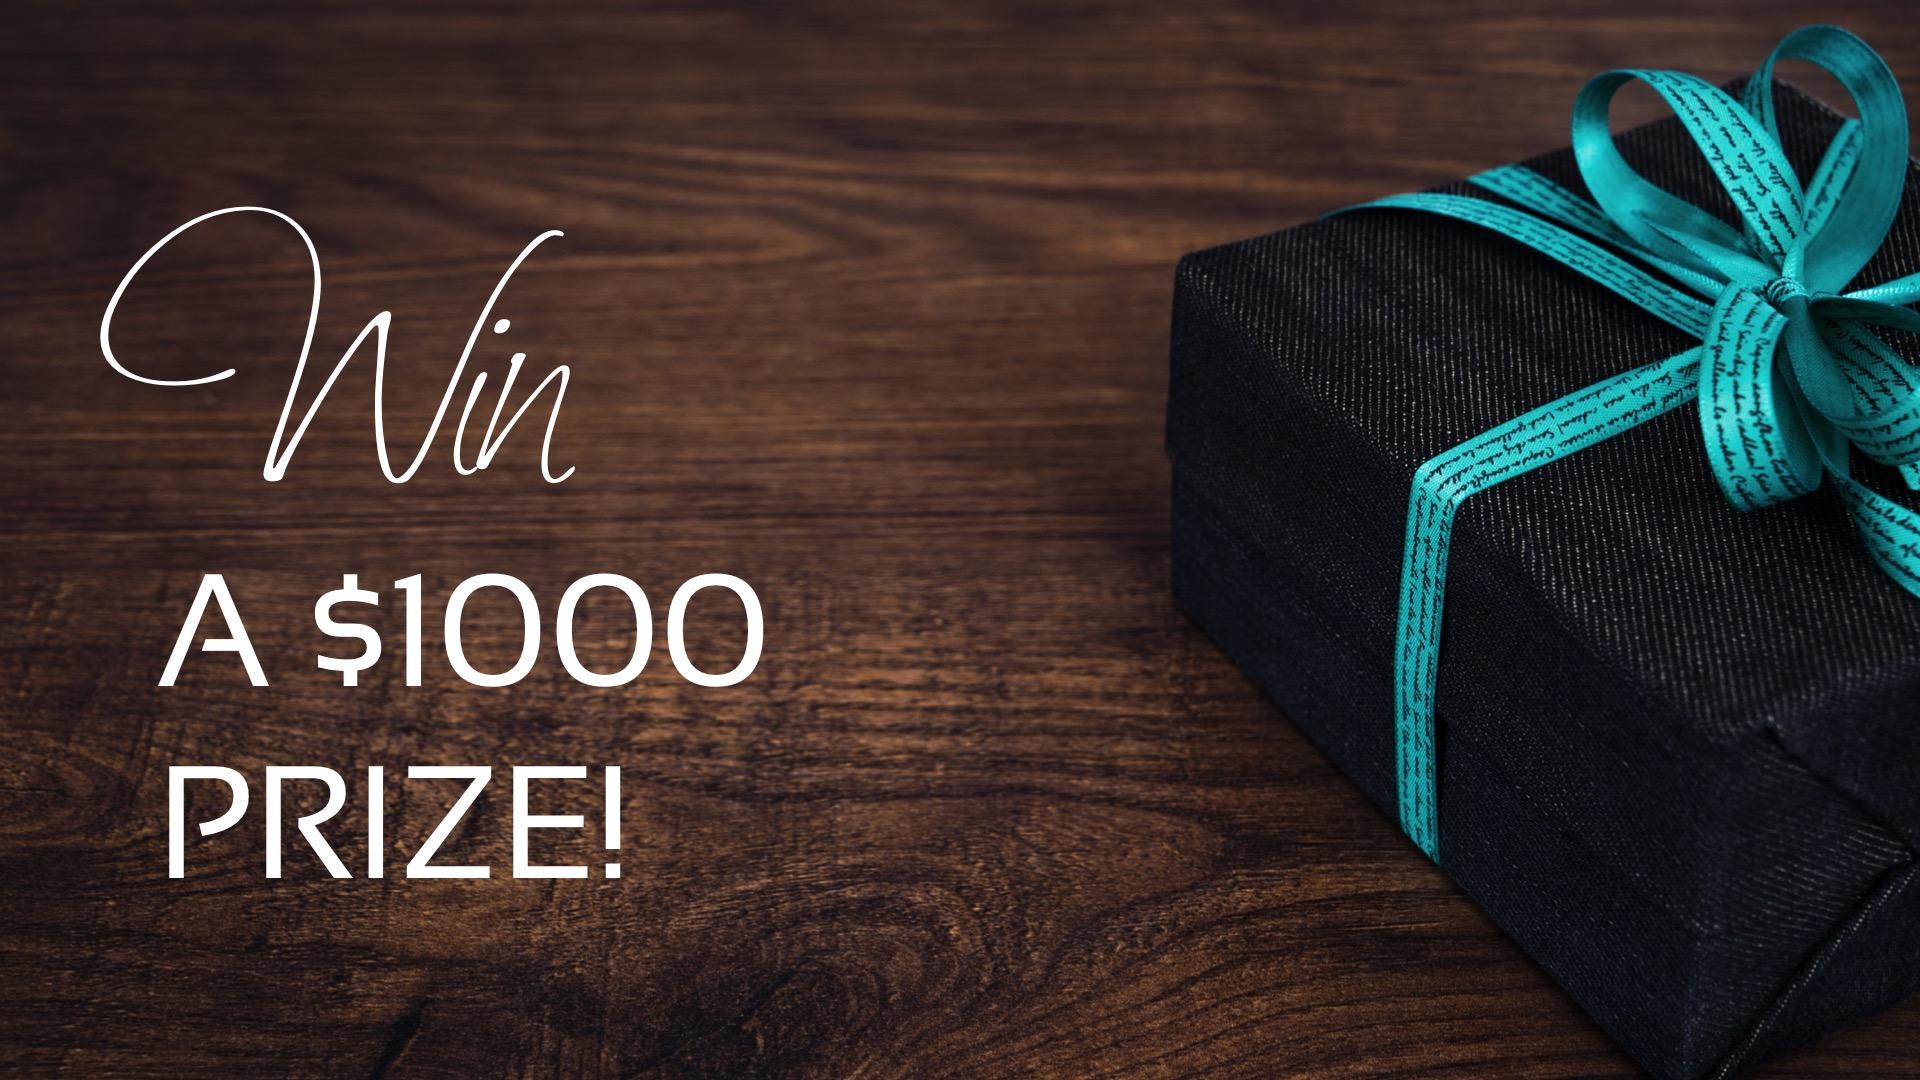 Win a $1000 prize